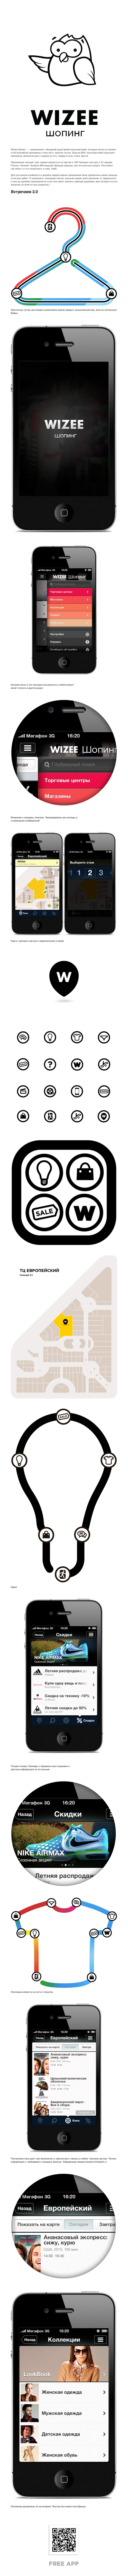 WIZEE Shopping App by Azamat Ivanov, via Behance